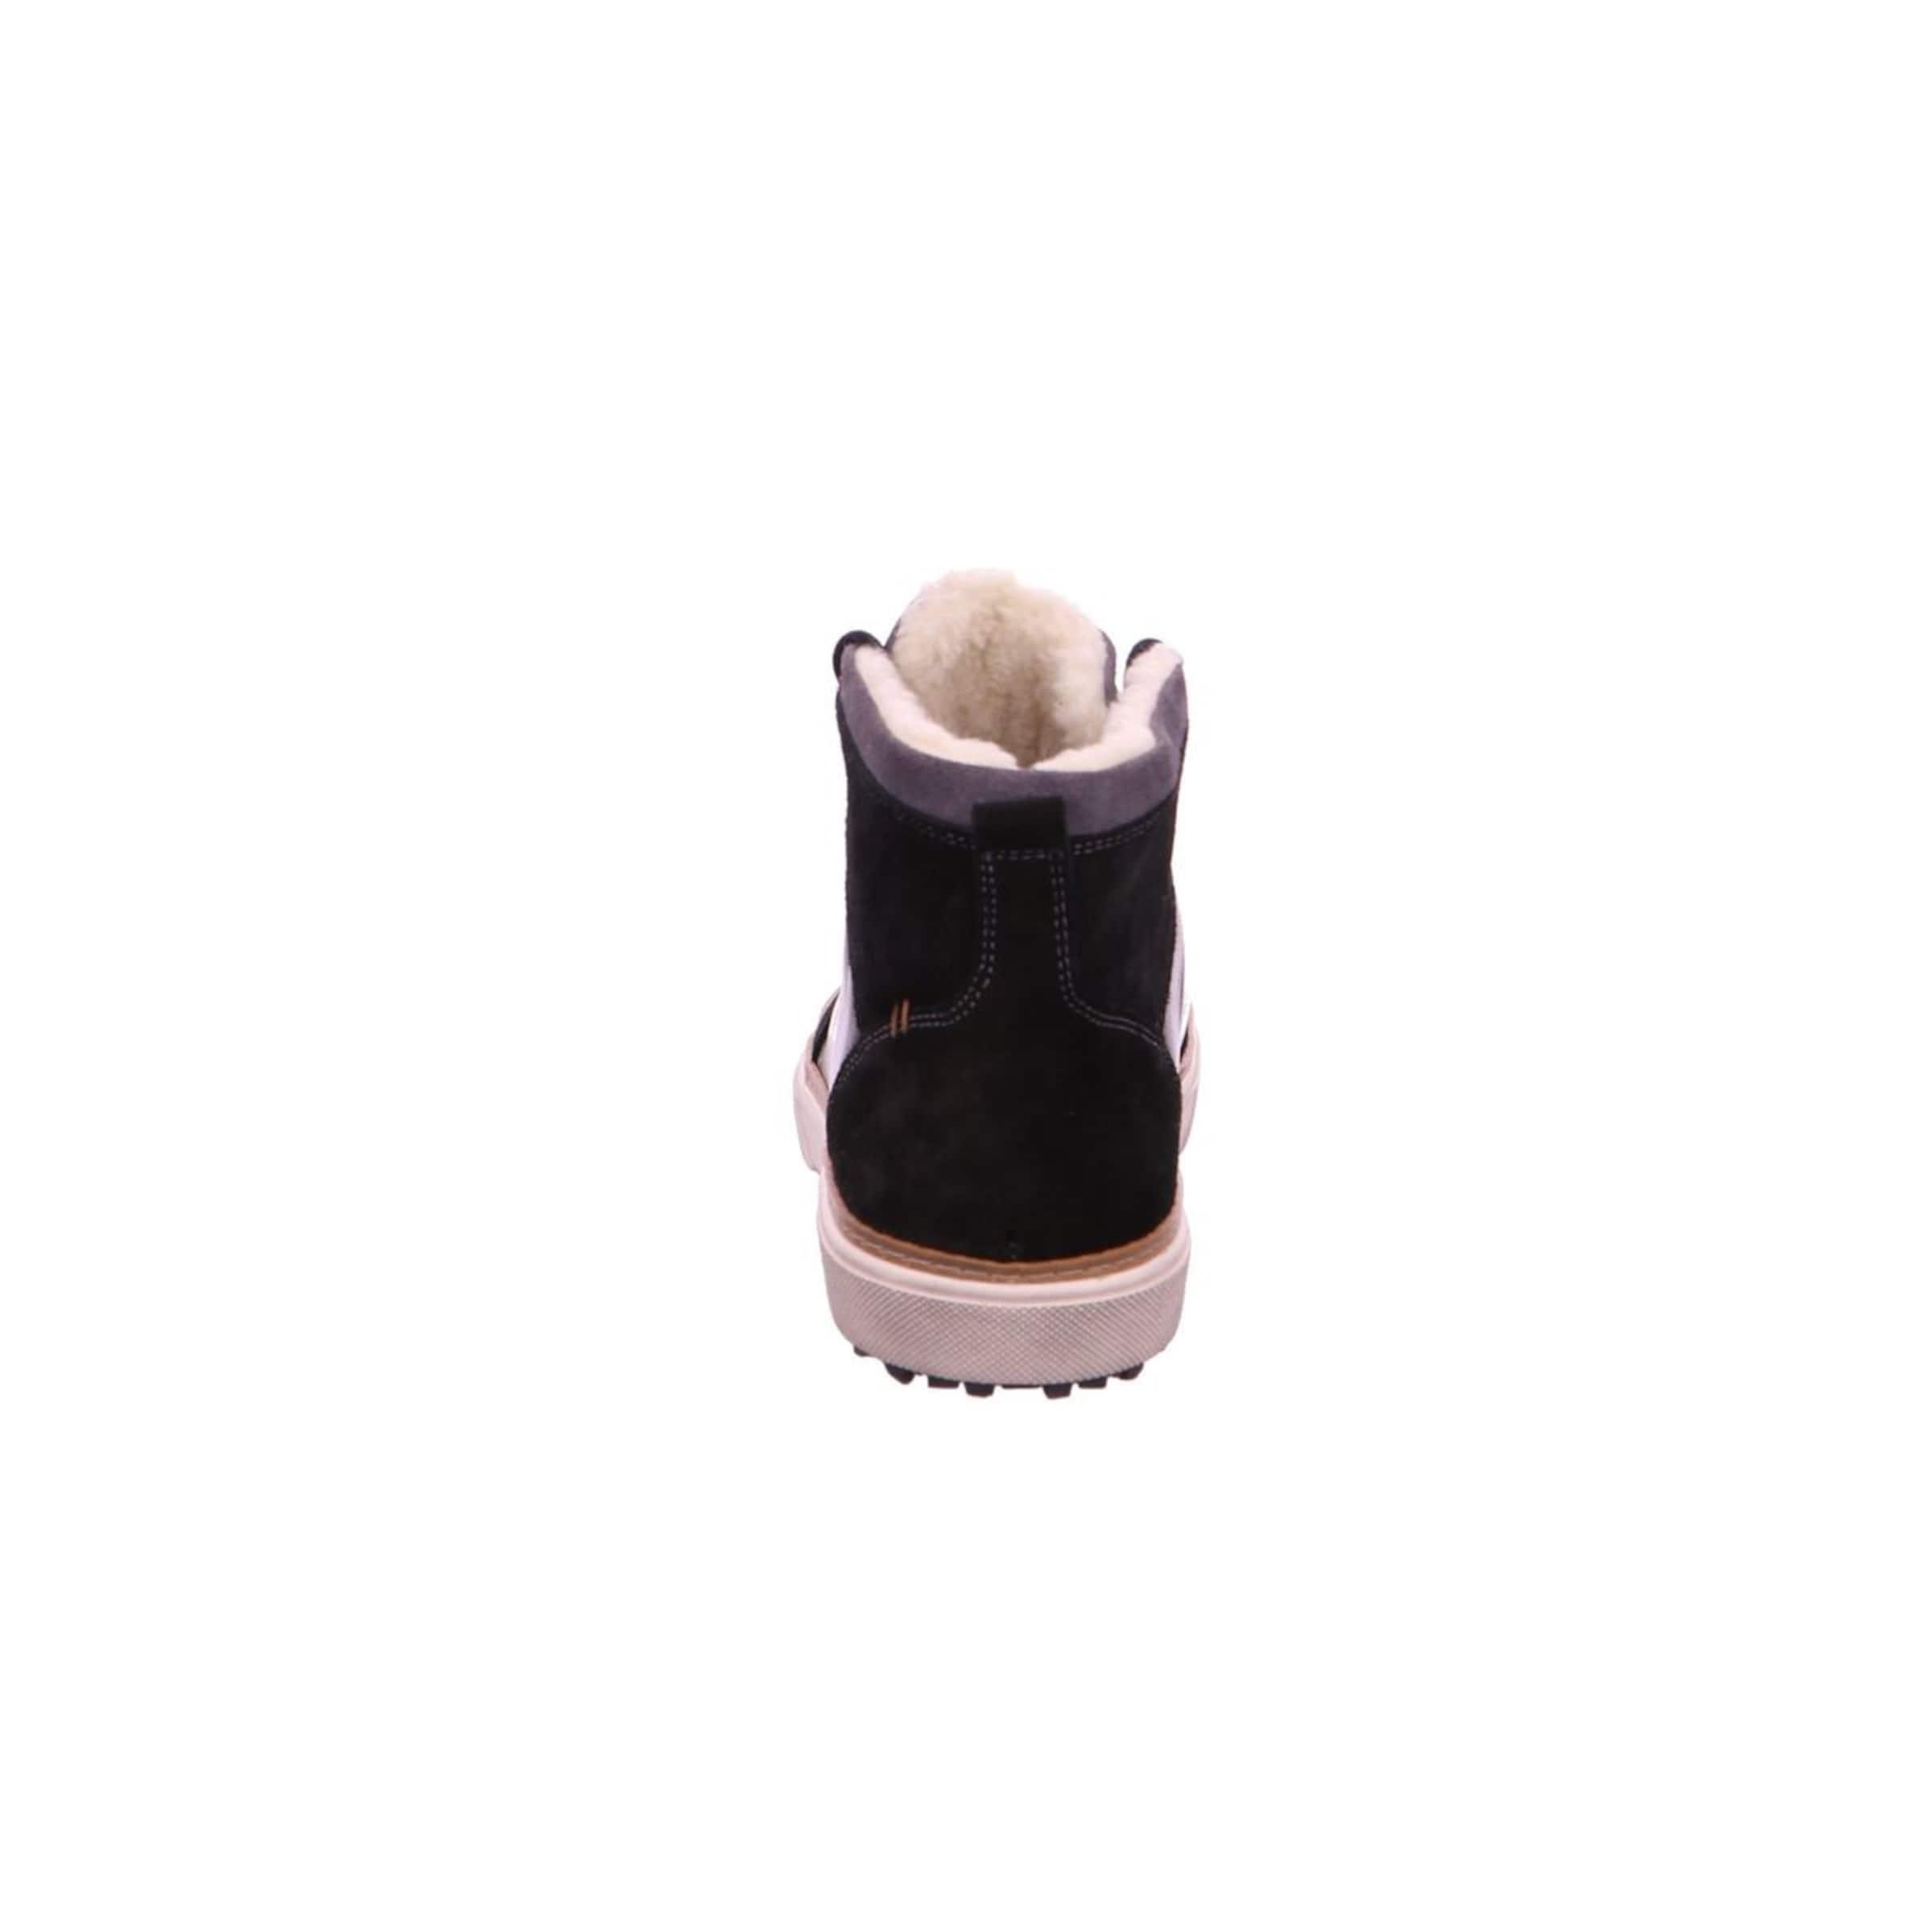 Stiefel Pantofola Pantofola In D'oro Schwarz LUqSpVjzMG